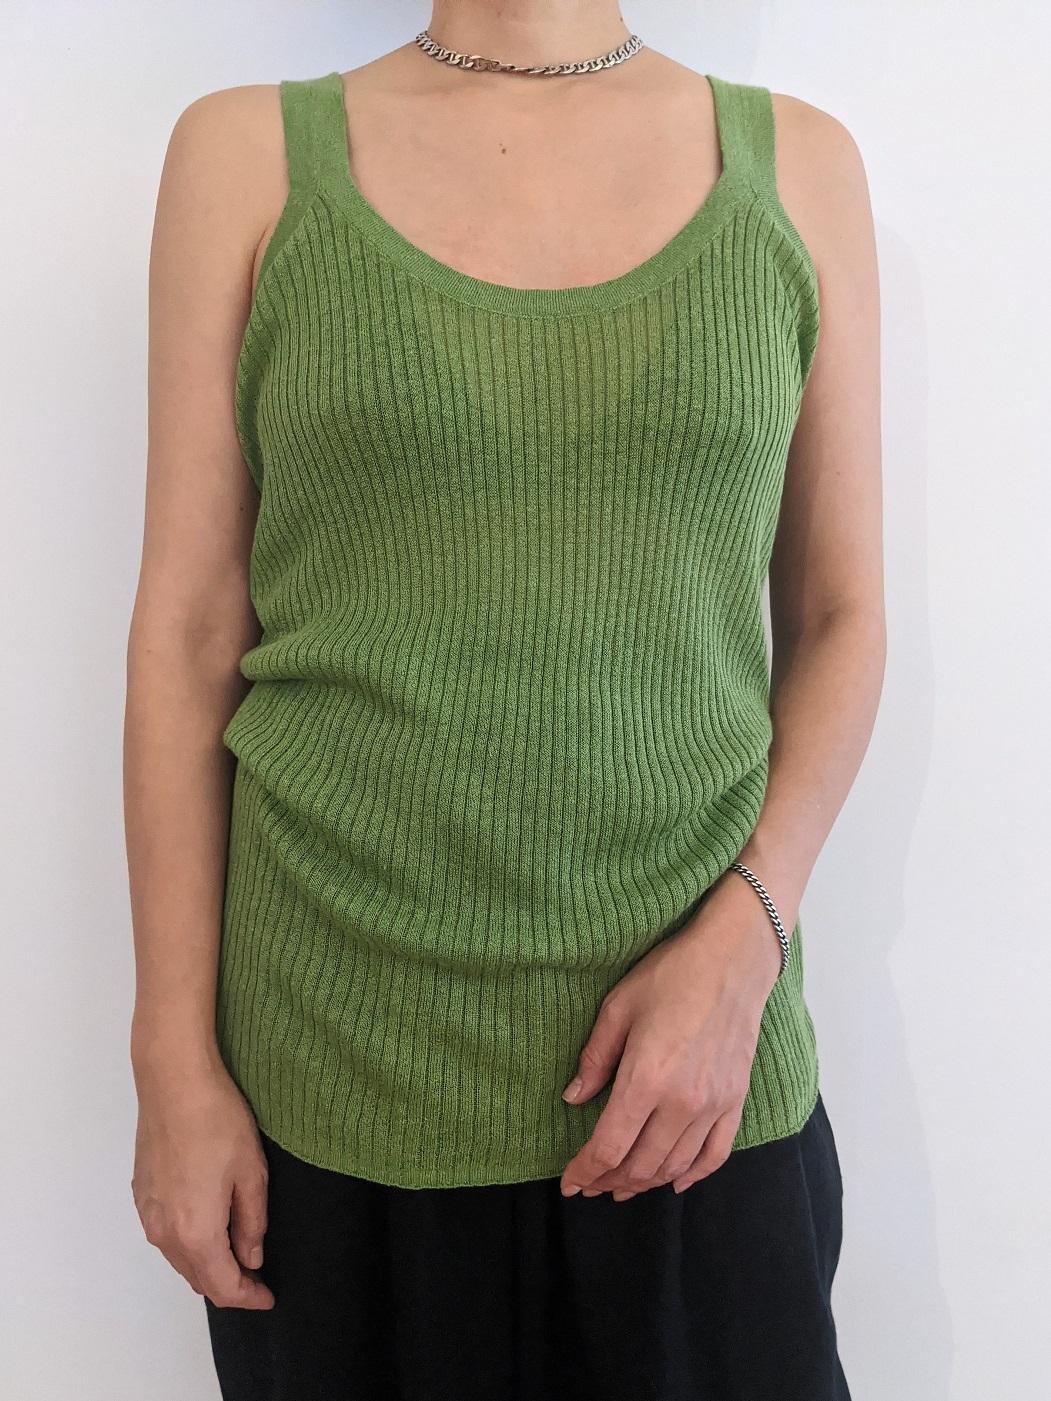 Rummy rib Tank top  - Bright green